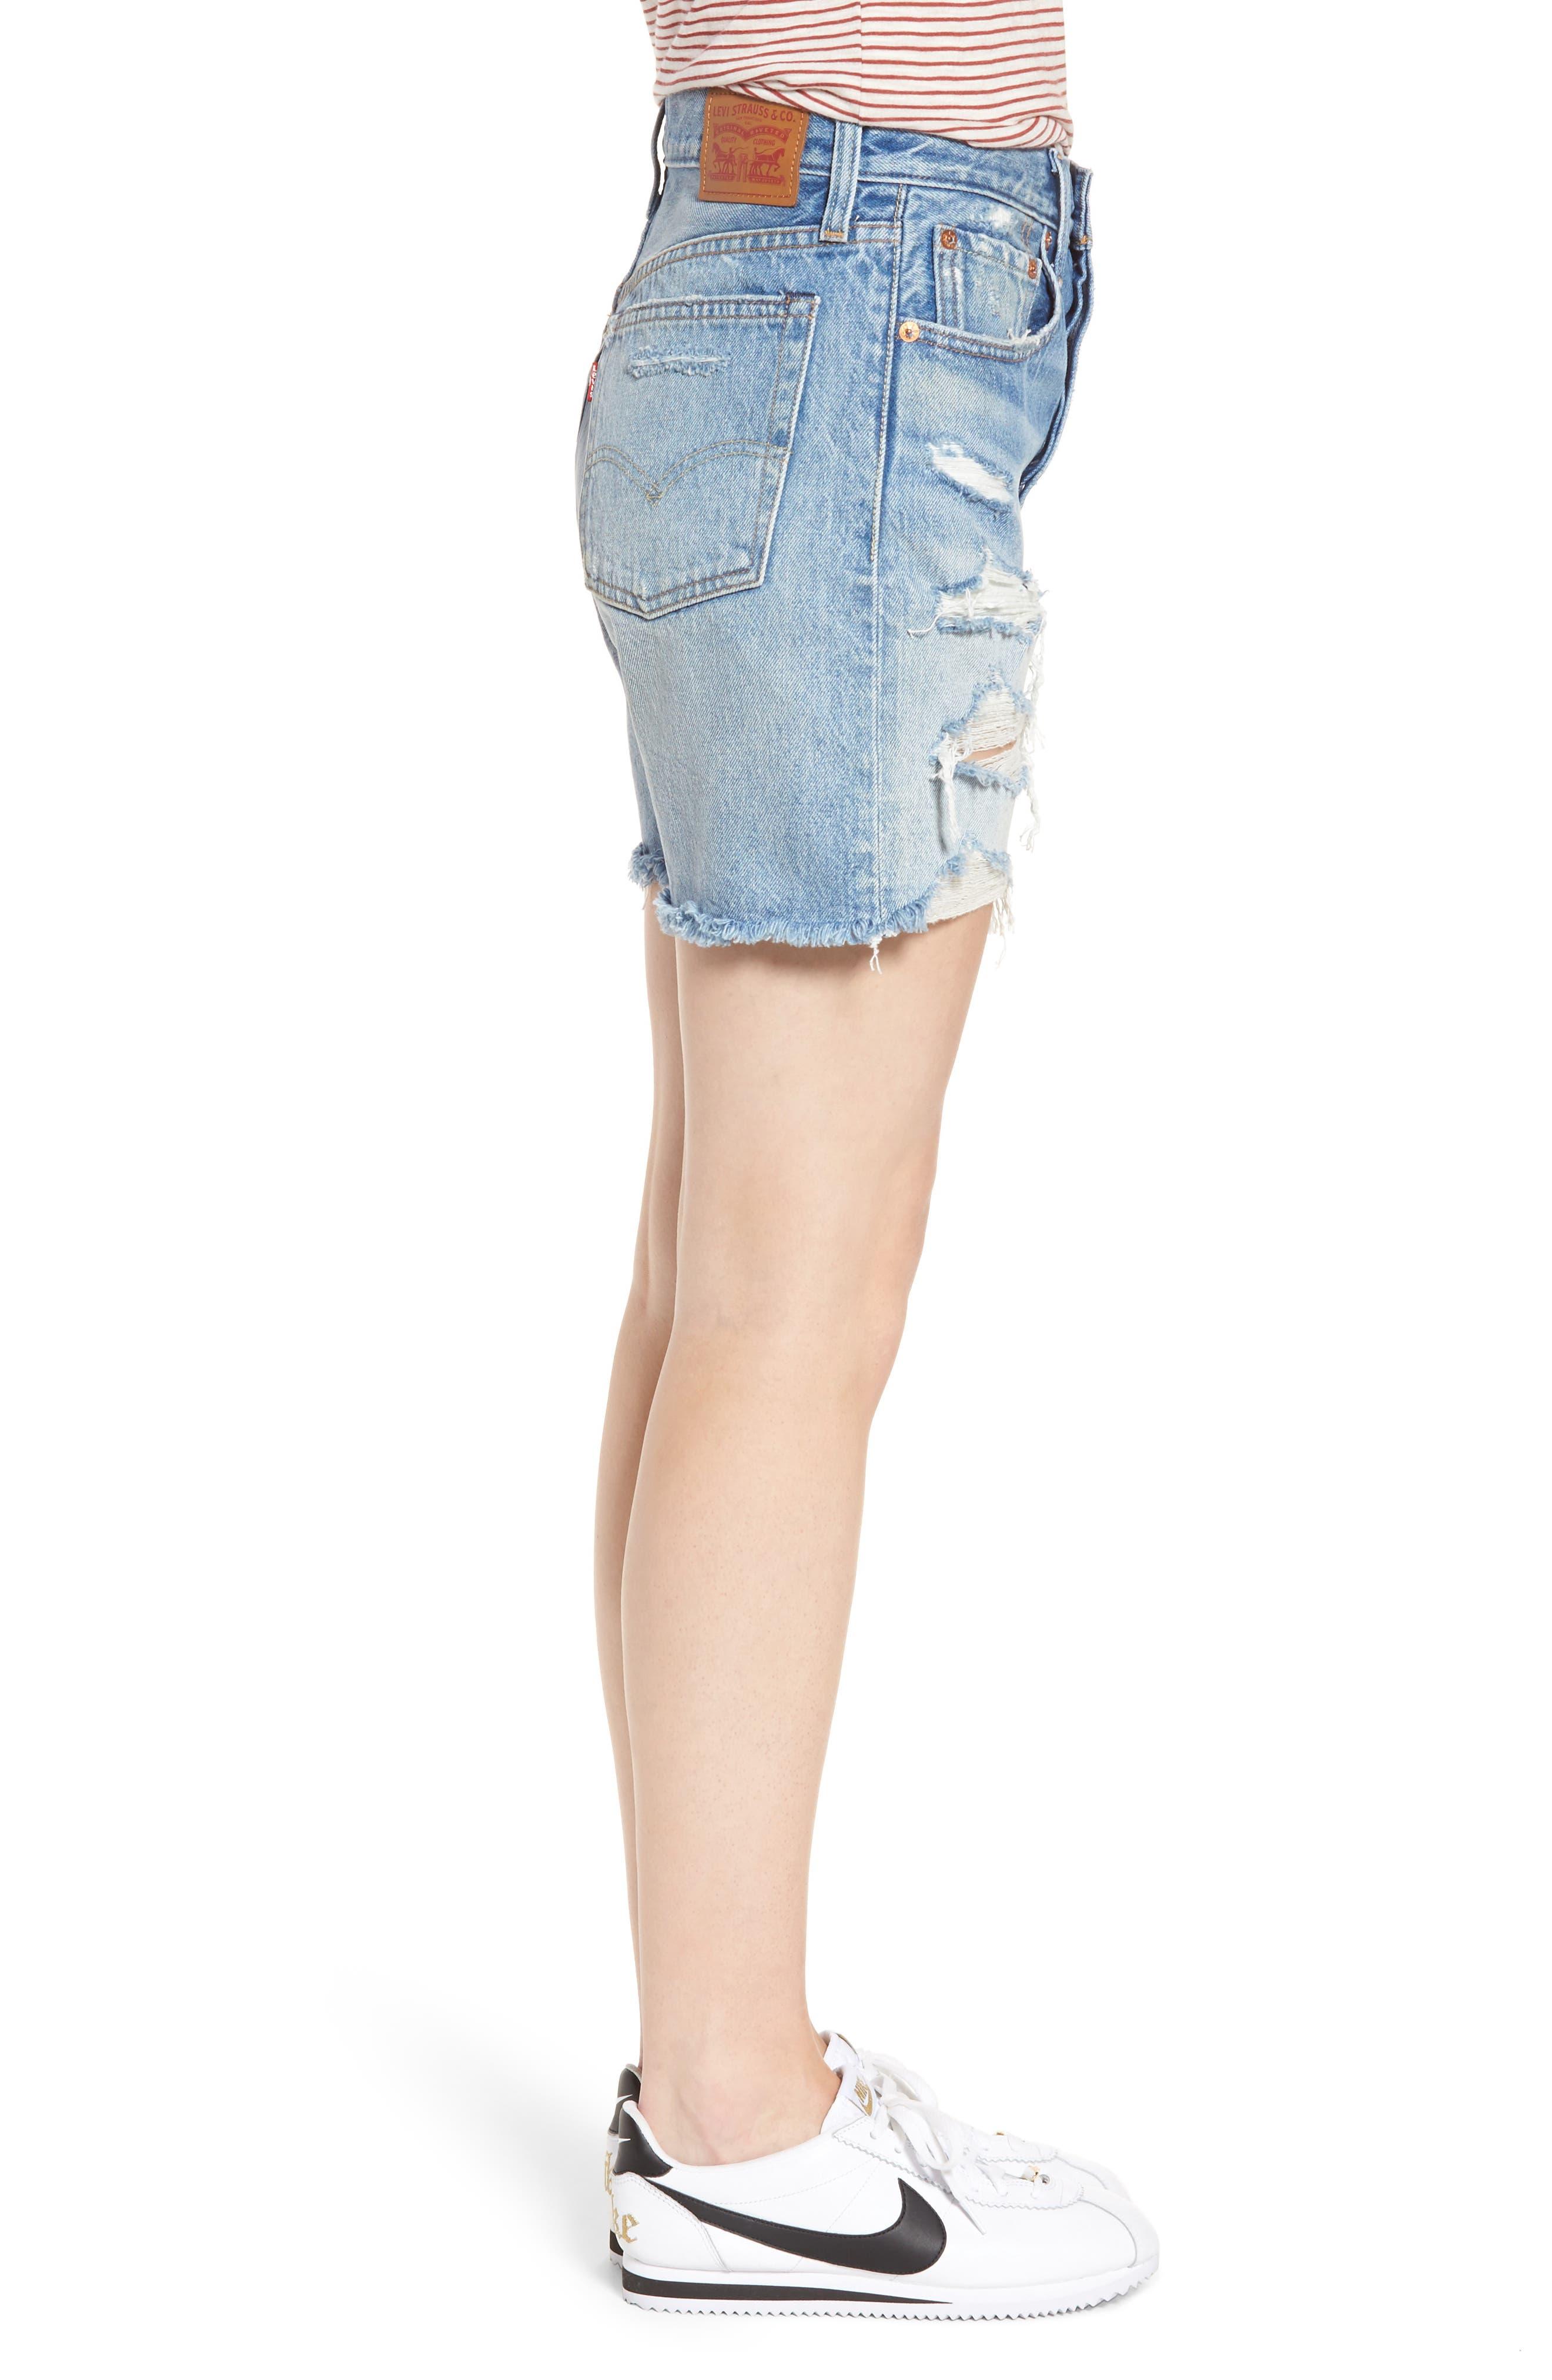 Indie Shredded Cutoff Denim Shorts,                             Alternate thumbnail 3, color,                             450